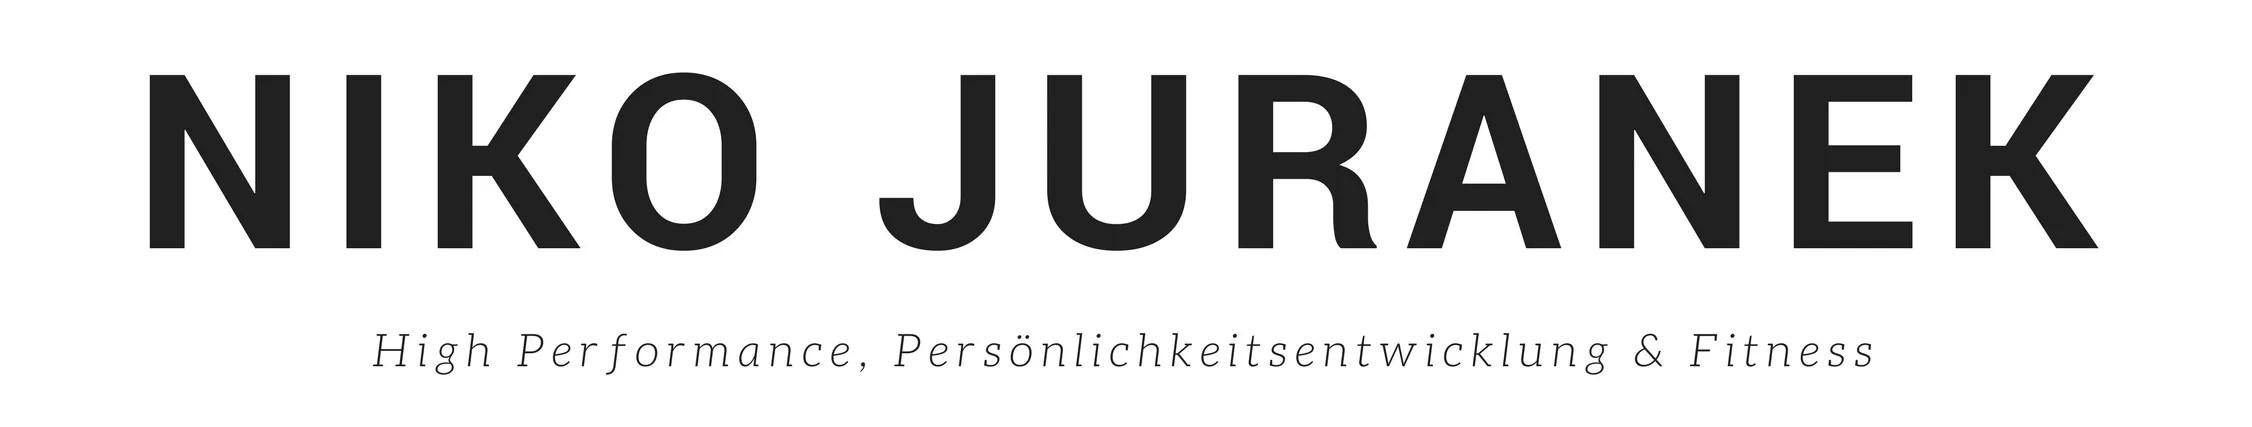 Niko Juranek